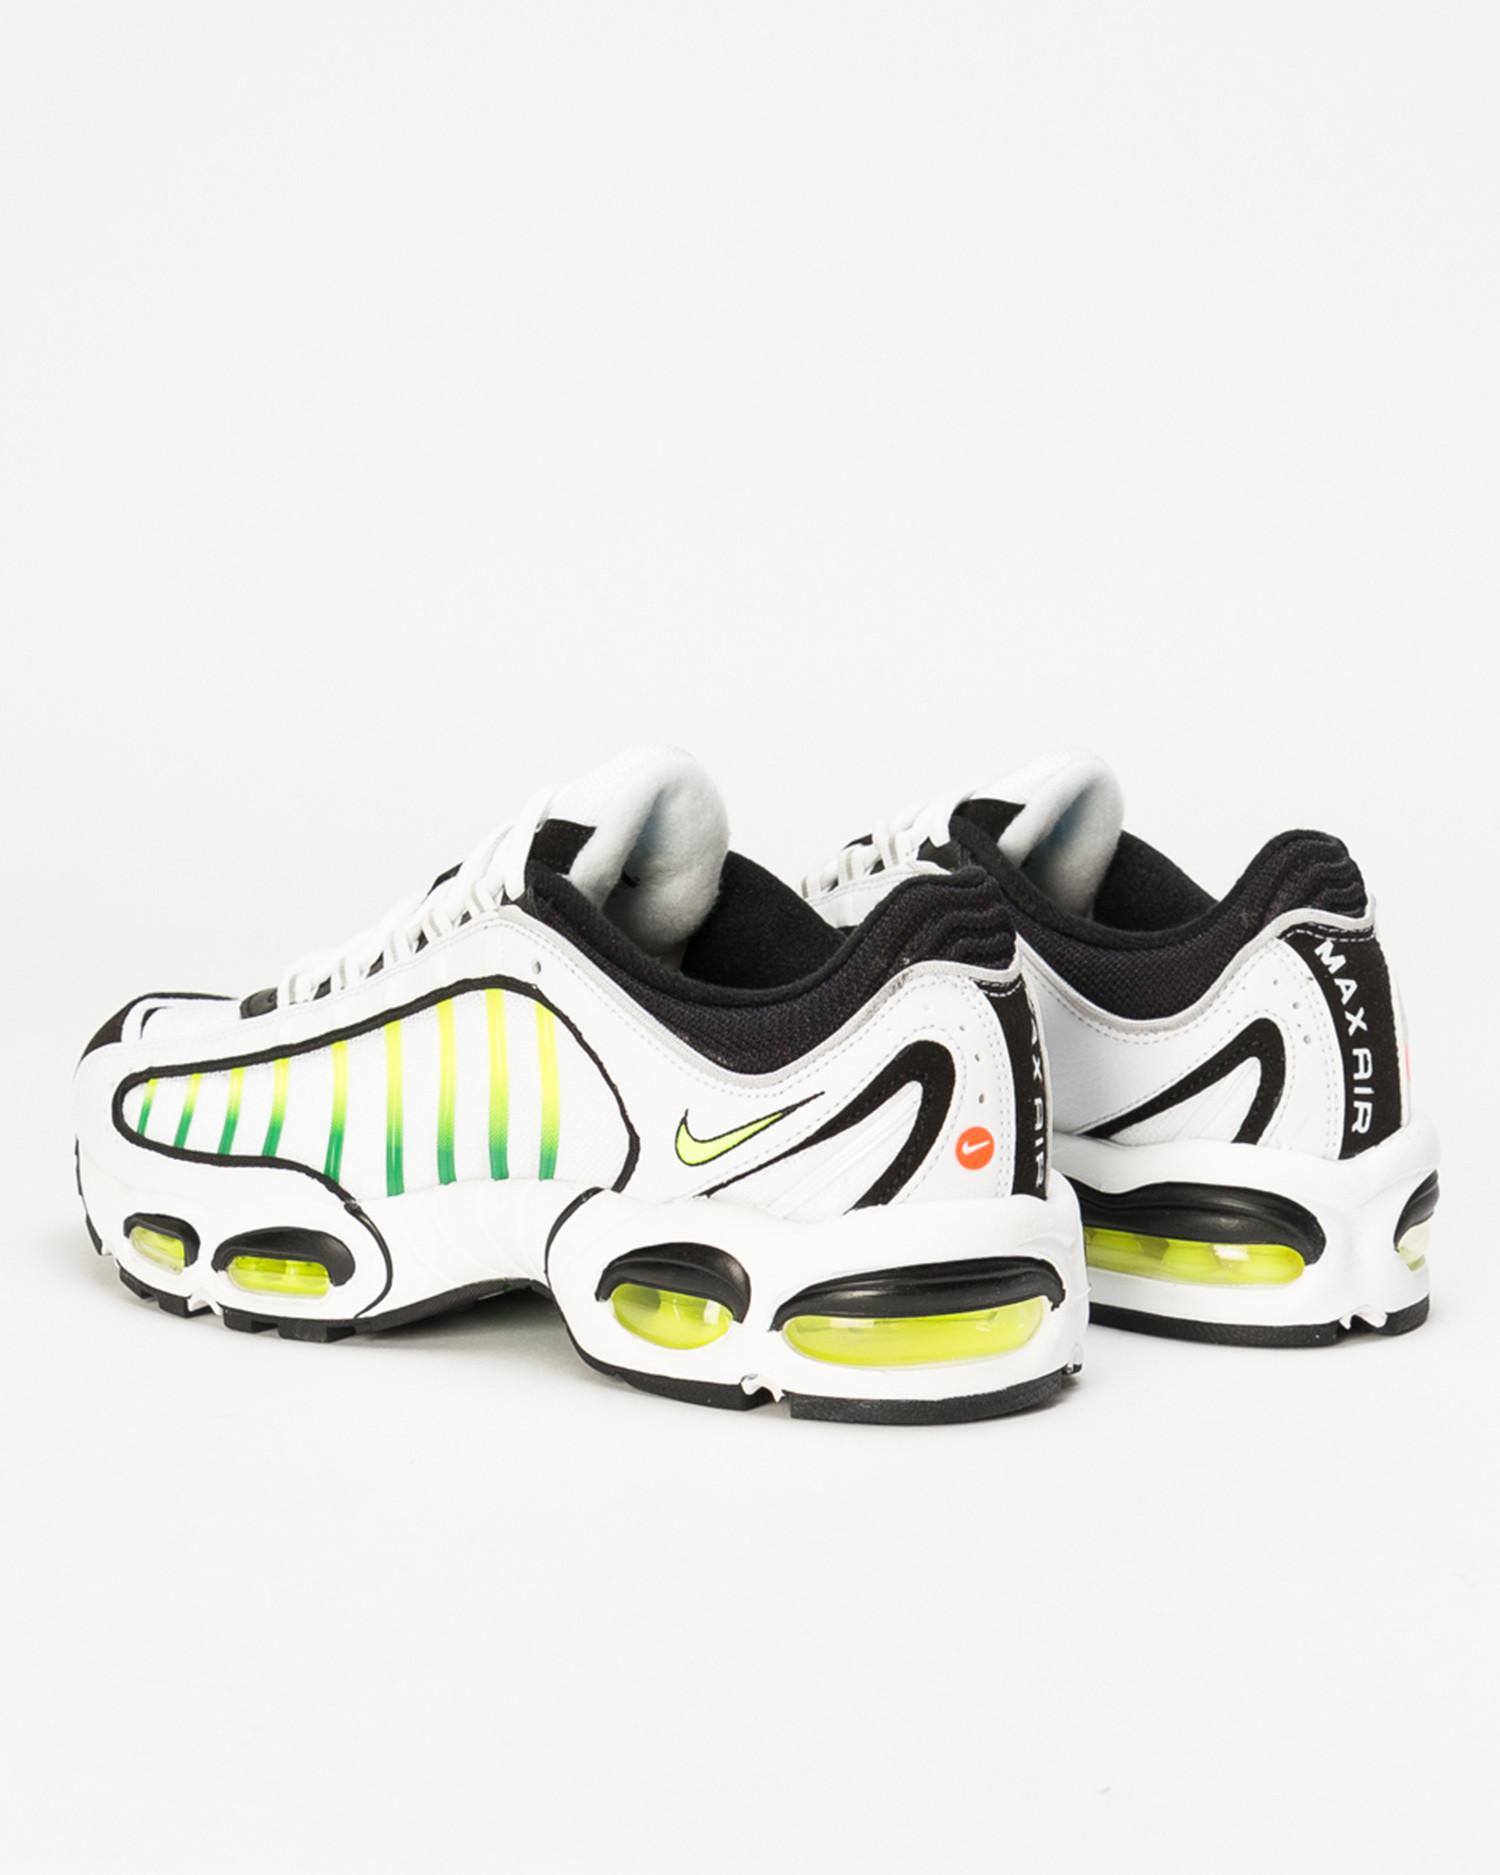 Nike Air Max Tailwind IV White/Volt-Black-Aloe Verde